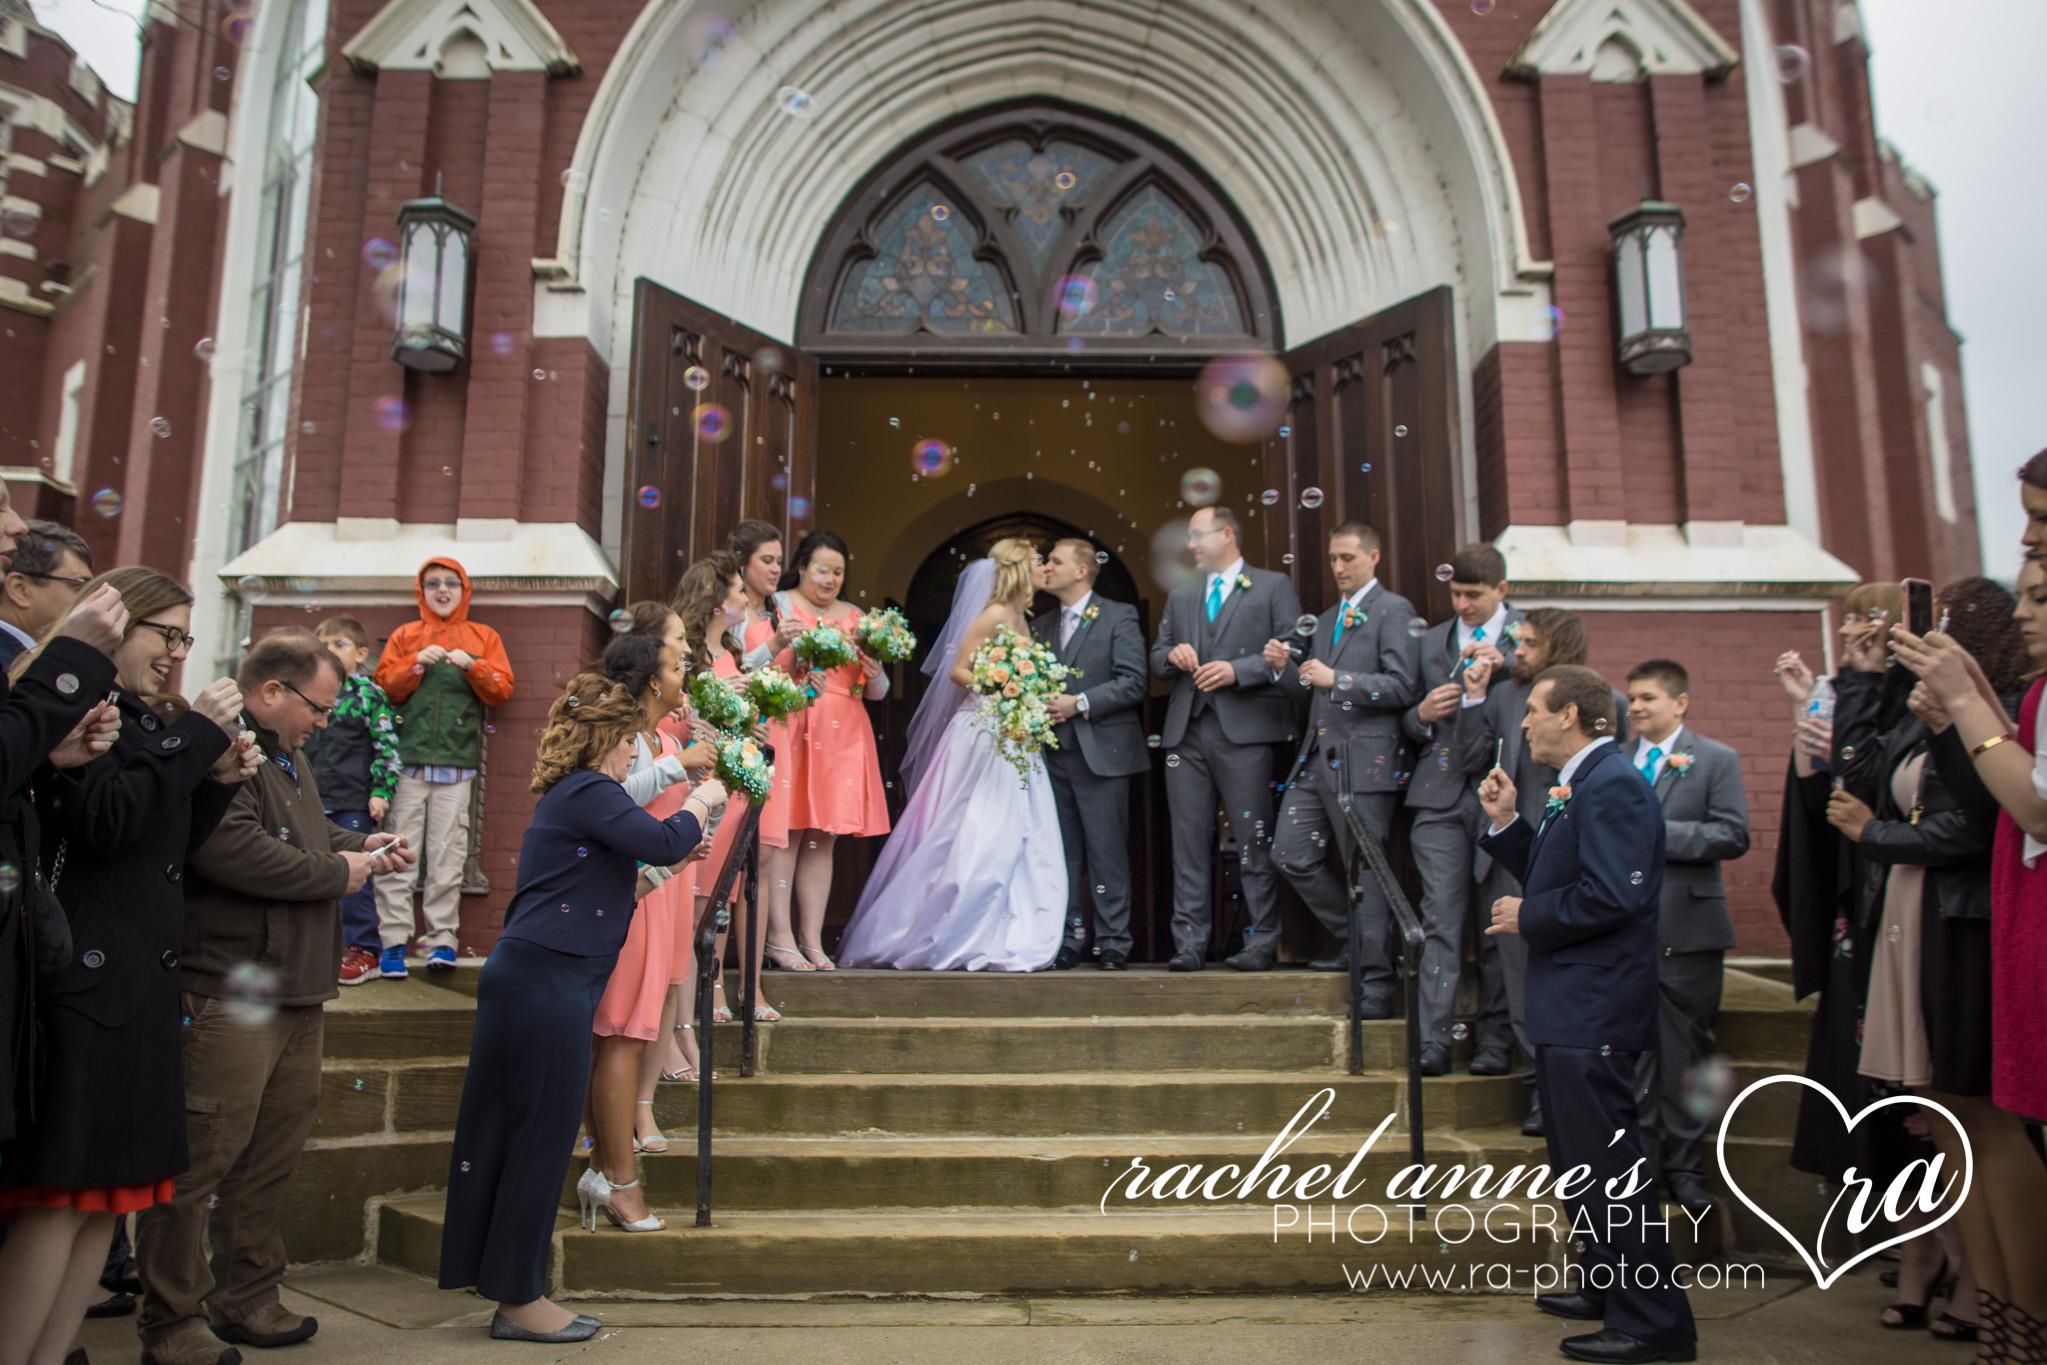 029-JKS-WEDDINGS-THE-FRANKLIN-PA.jpg